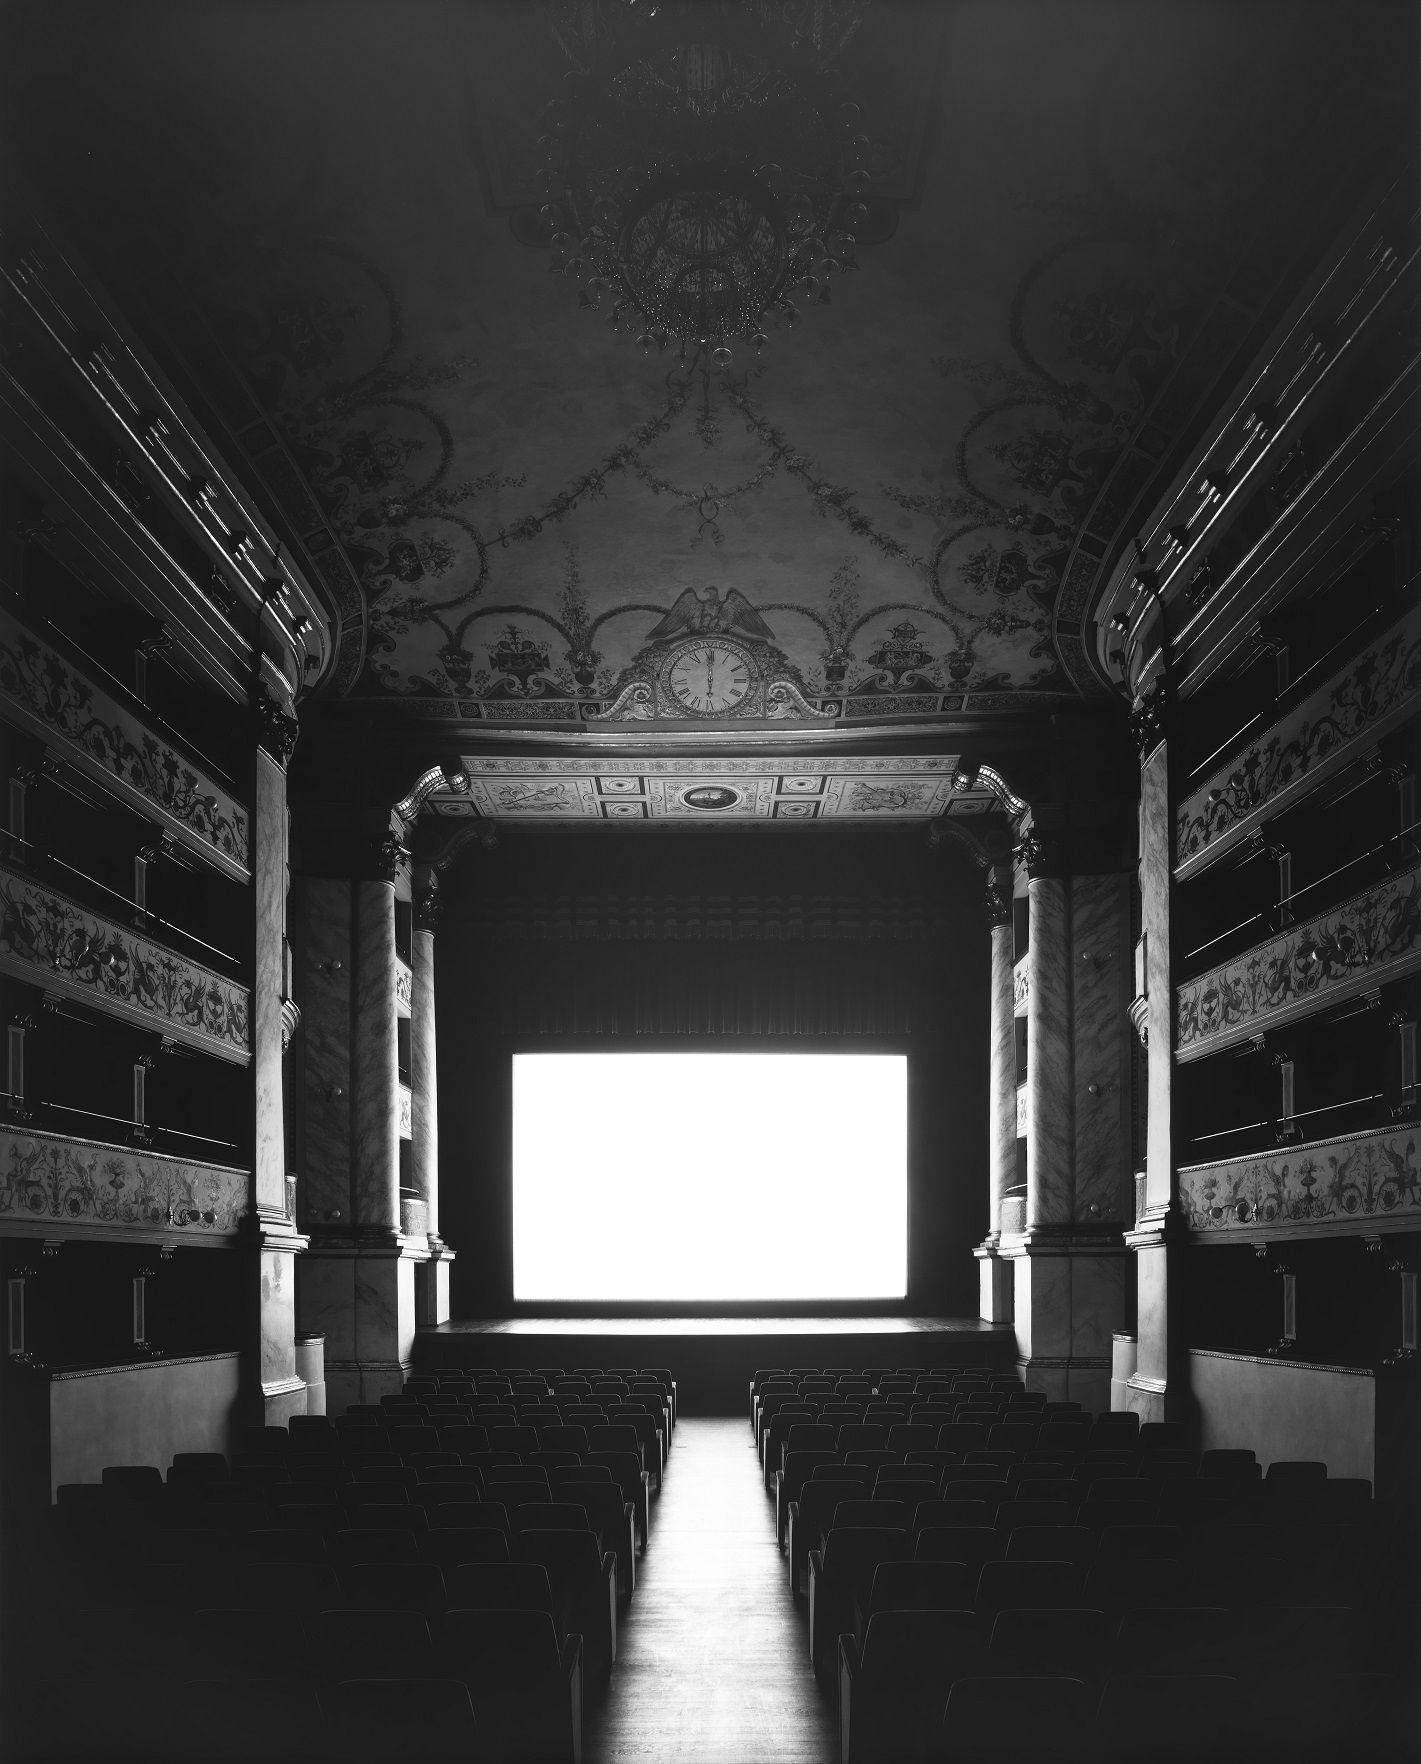 Hiroshi Sugimoto, Teatro Dei Rinnovati